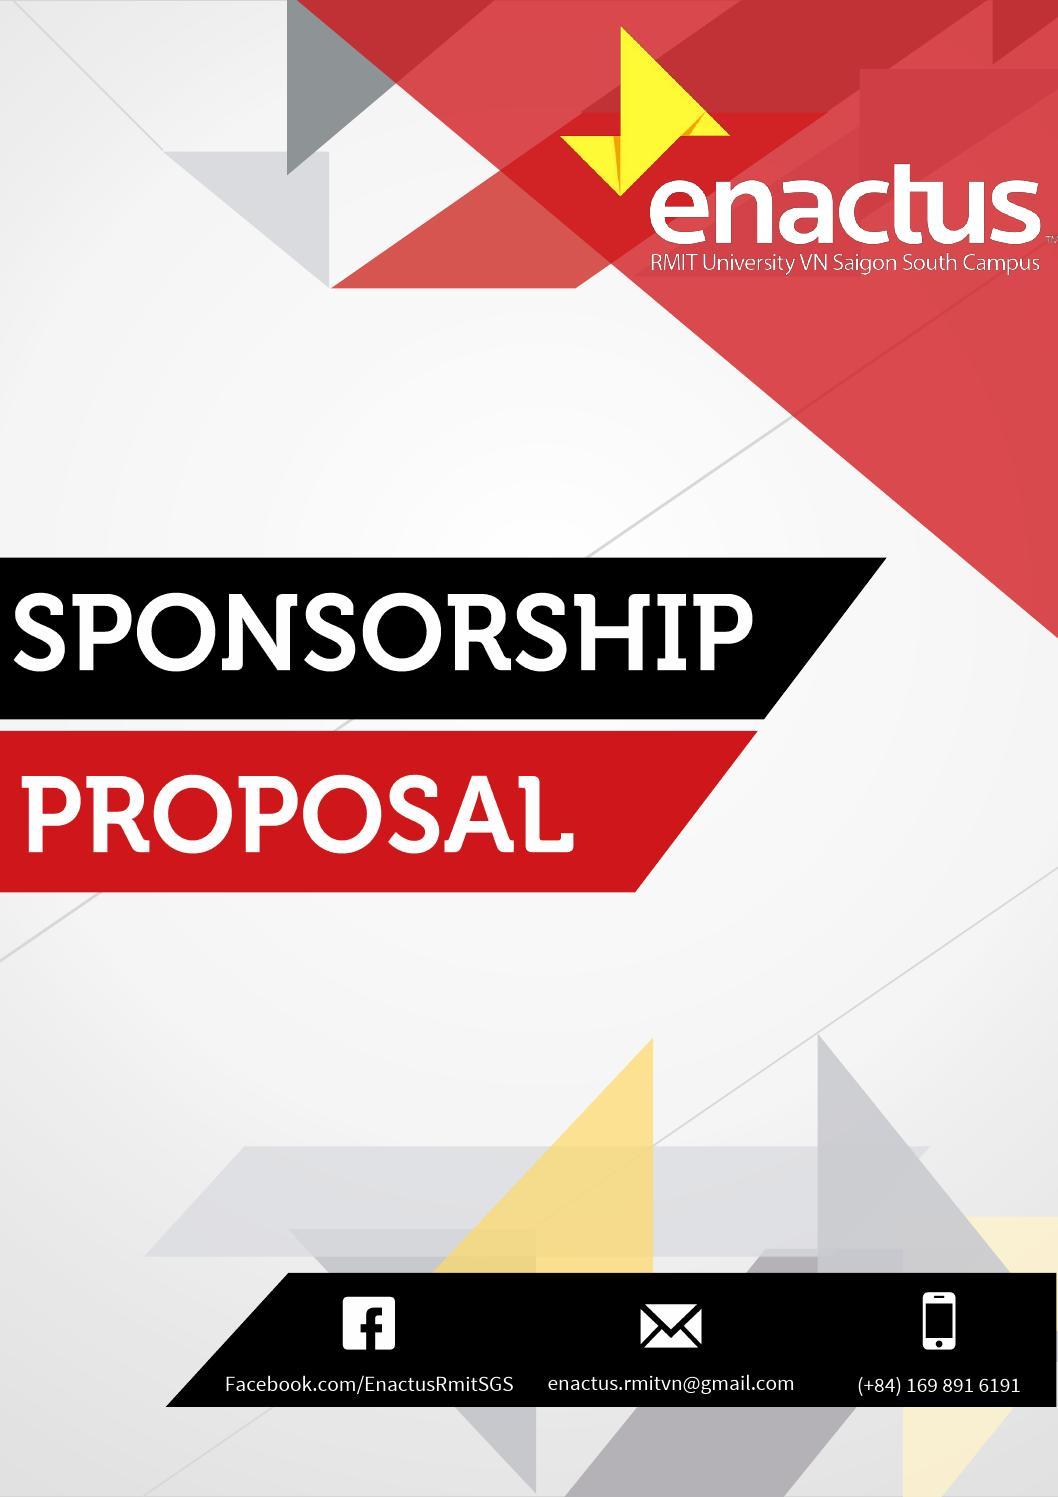 sponsorship proposal - enactus rmit vietnam sgs (2013)minh, Powerpoint templates